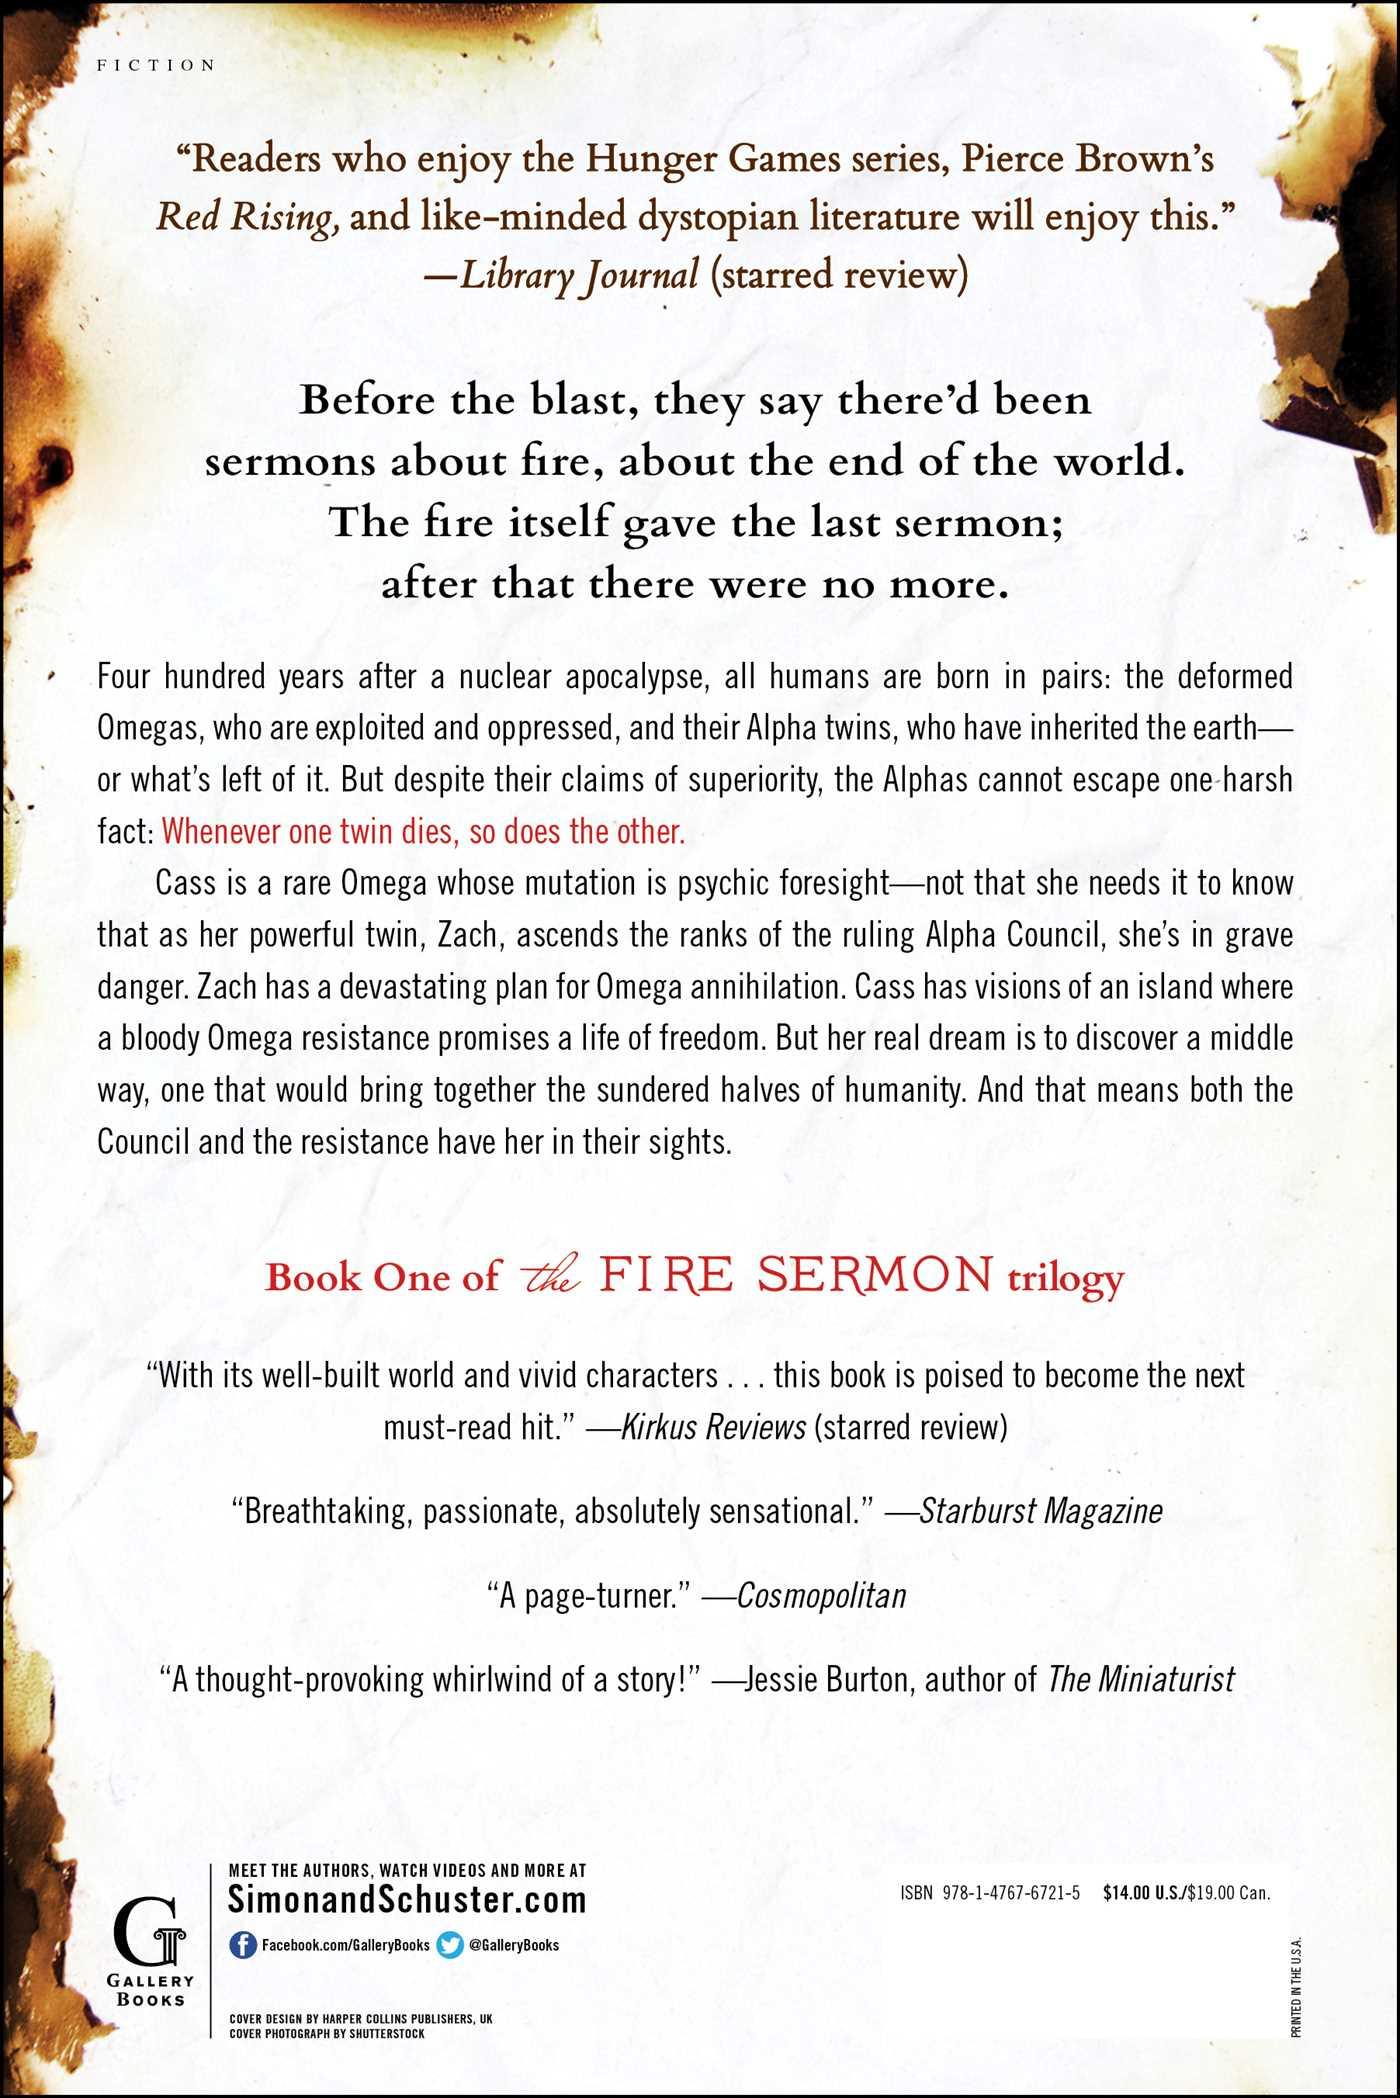 The fire sermon 9781476767215 hr back